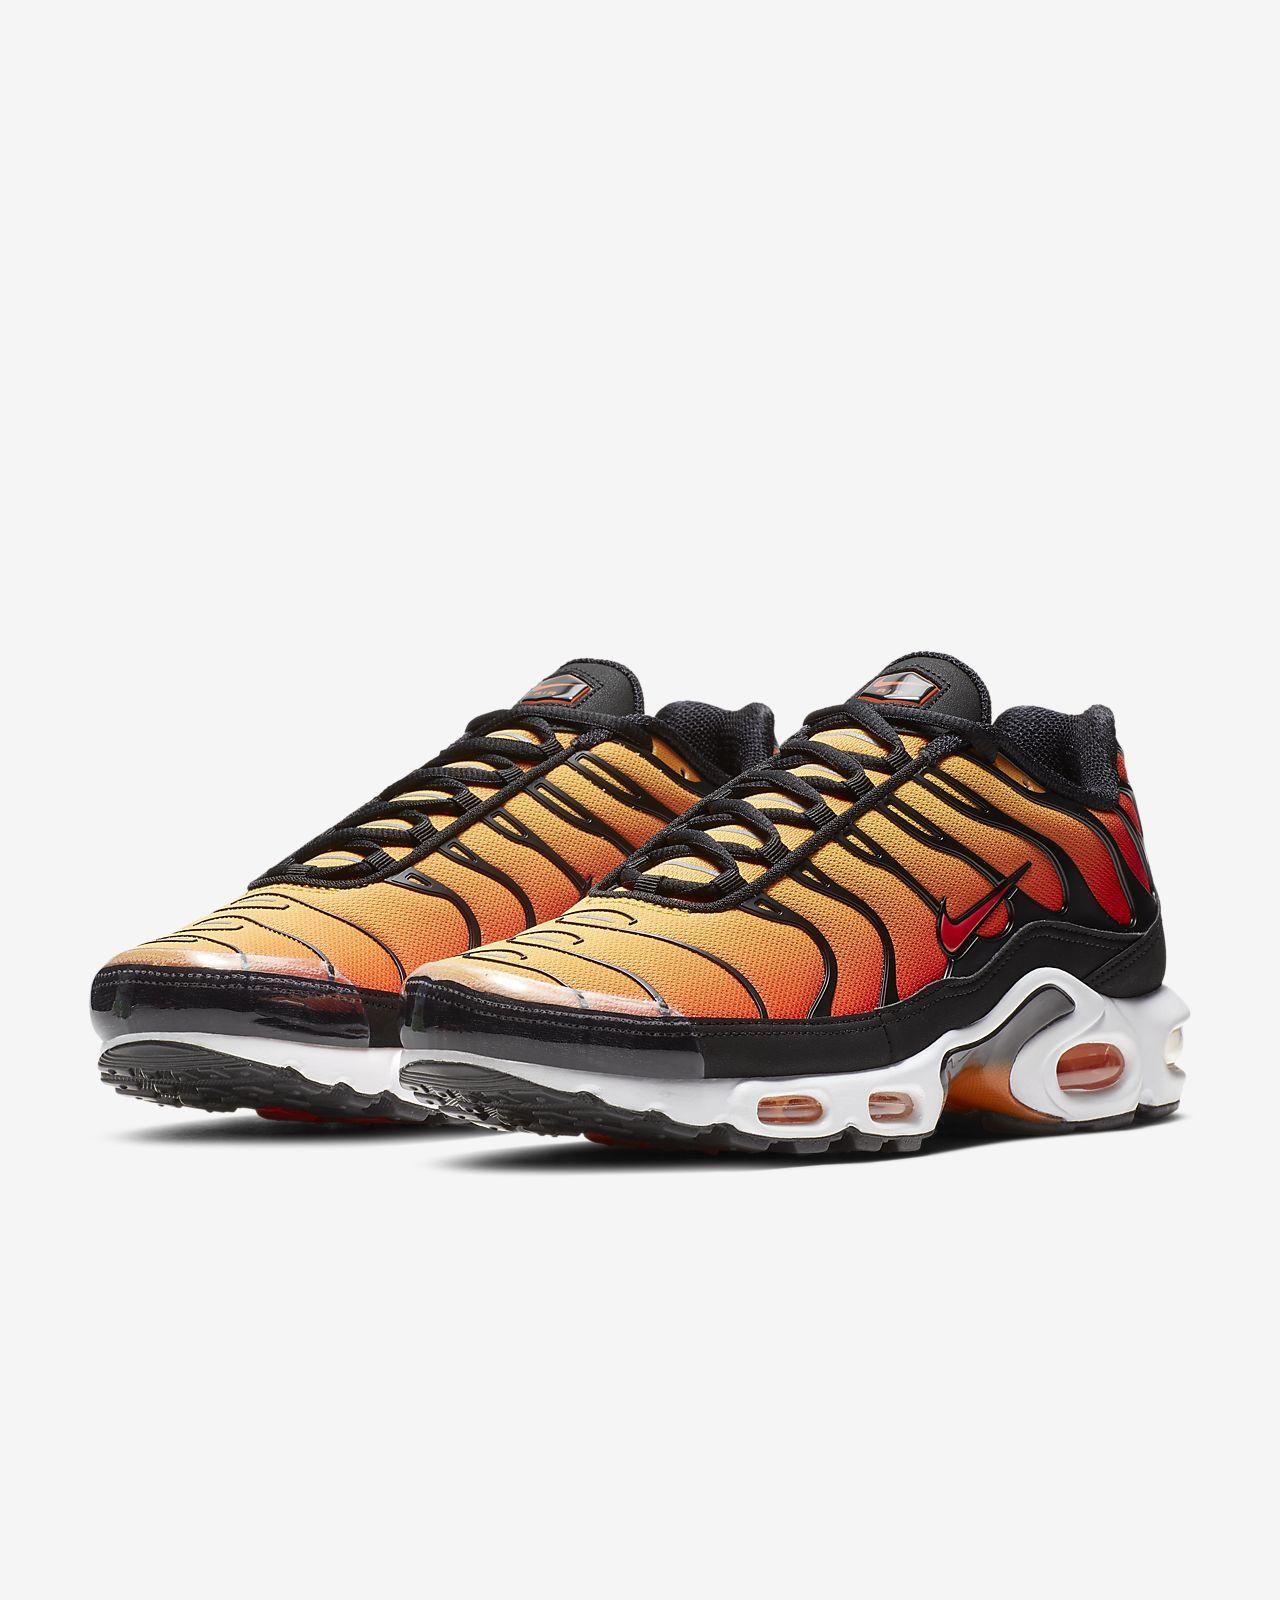 san francisco 75f89 edf59 ... Nike Air Max Plus OG Shoe